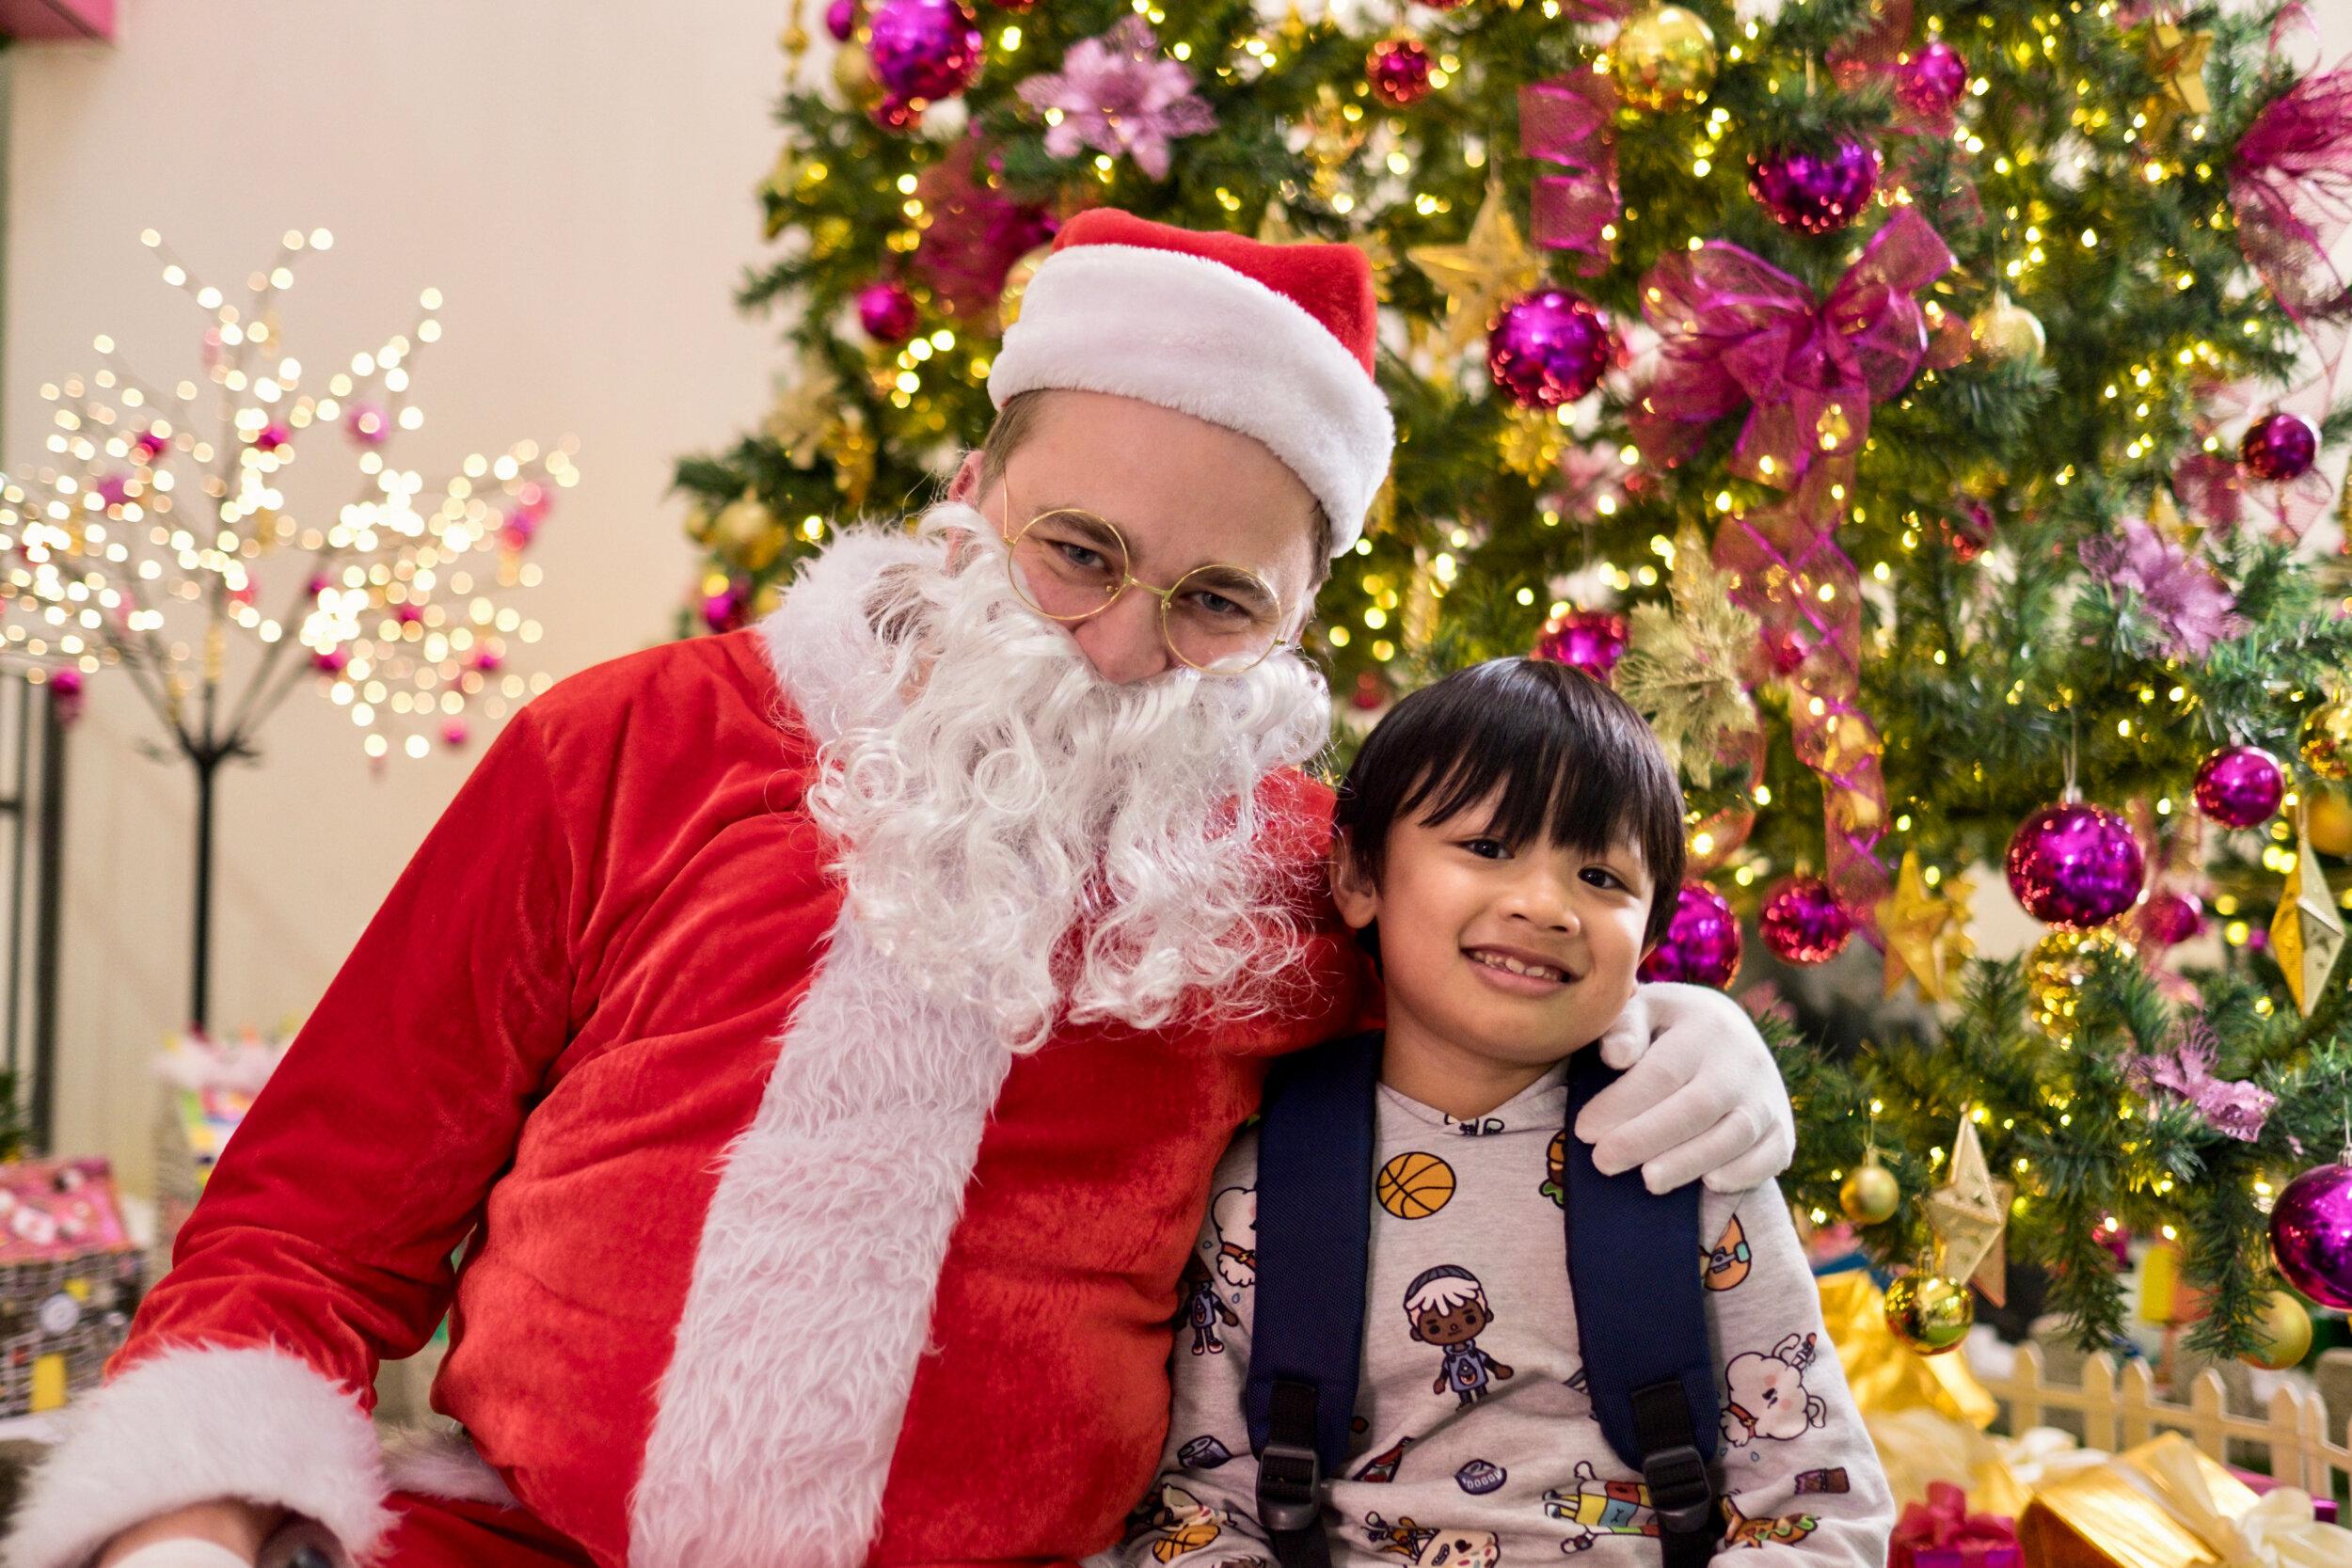 Photoshoot with Santa Clause-919.jpg